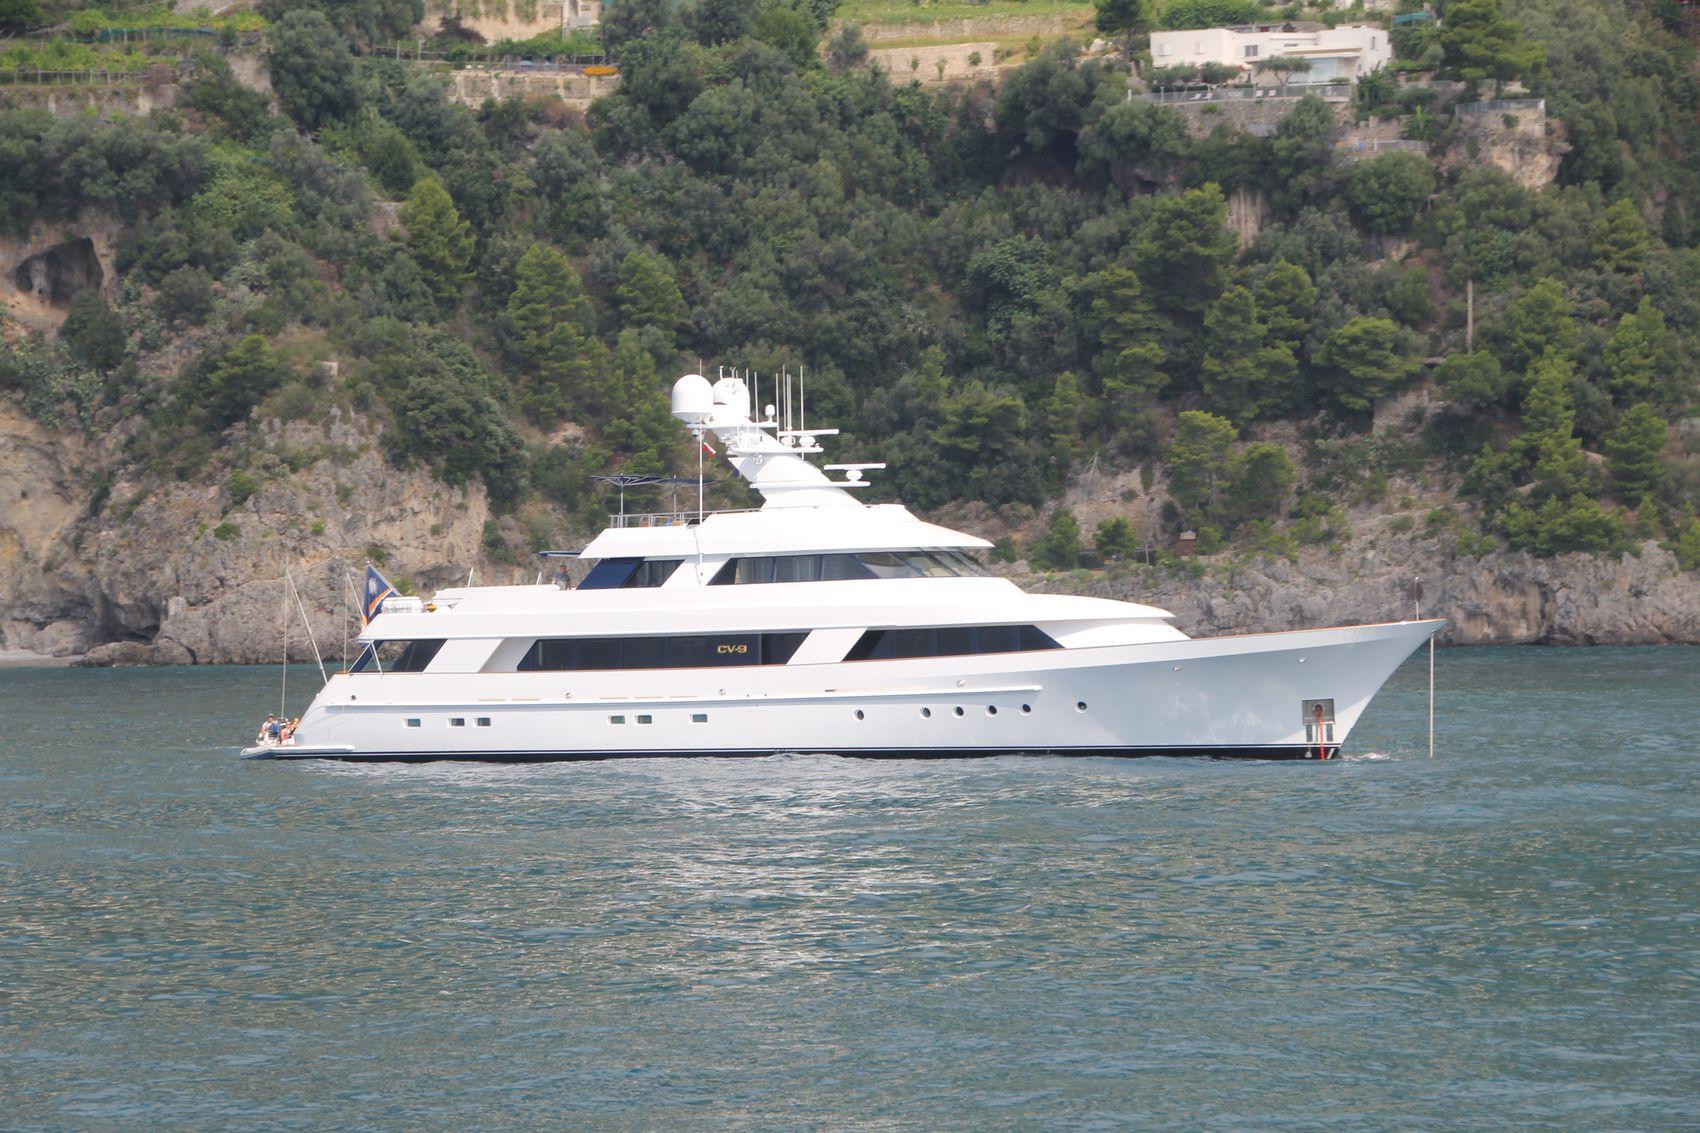 cv-9 yacht